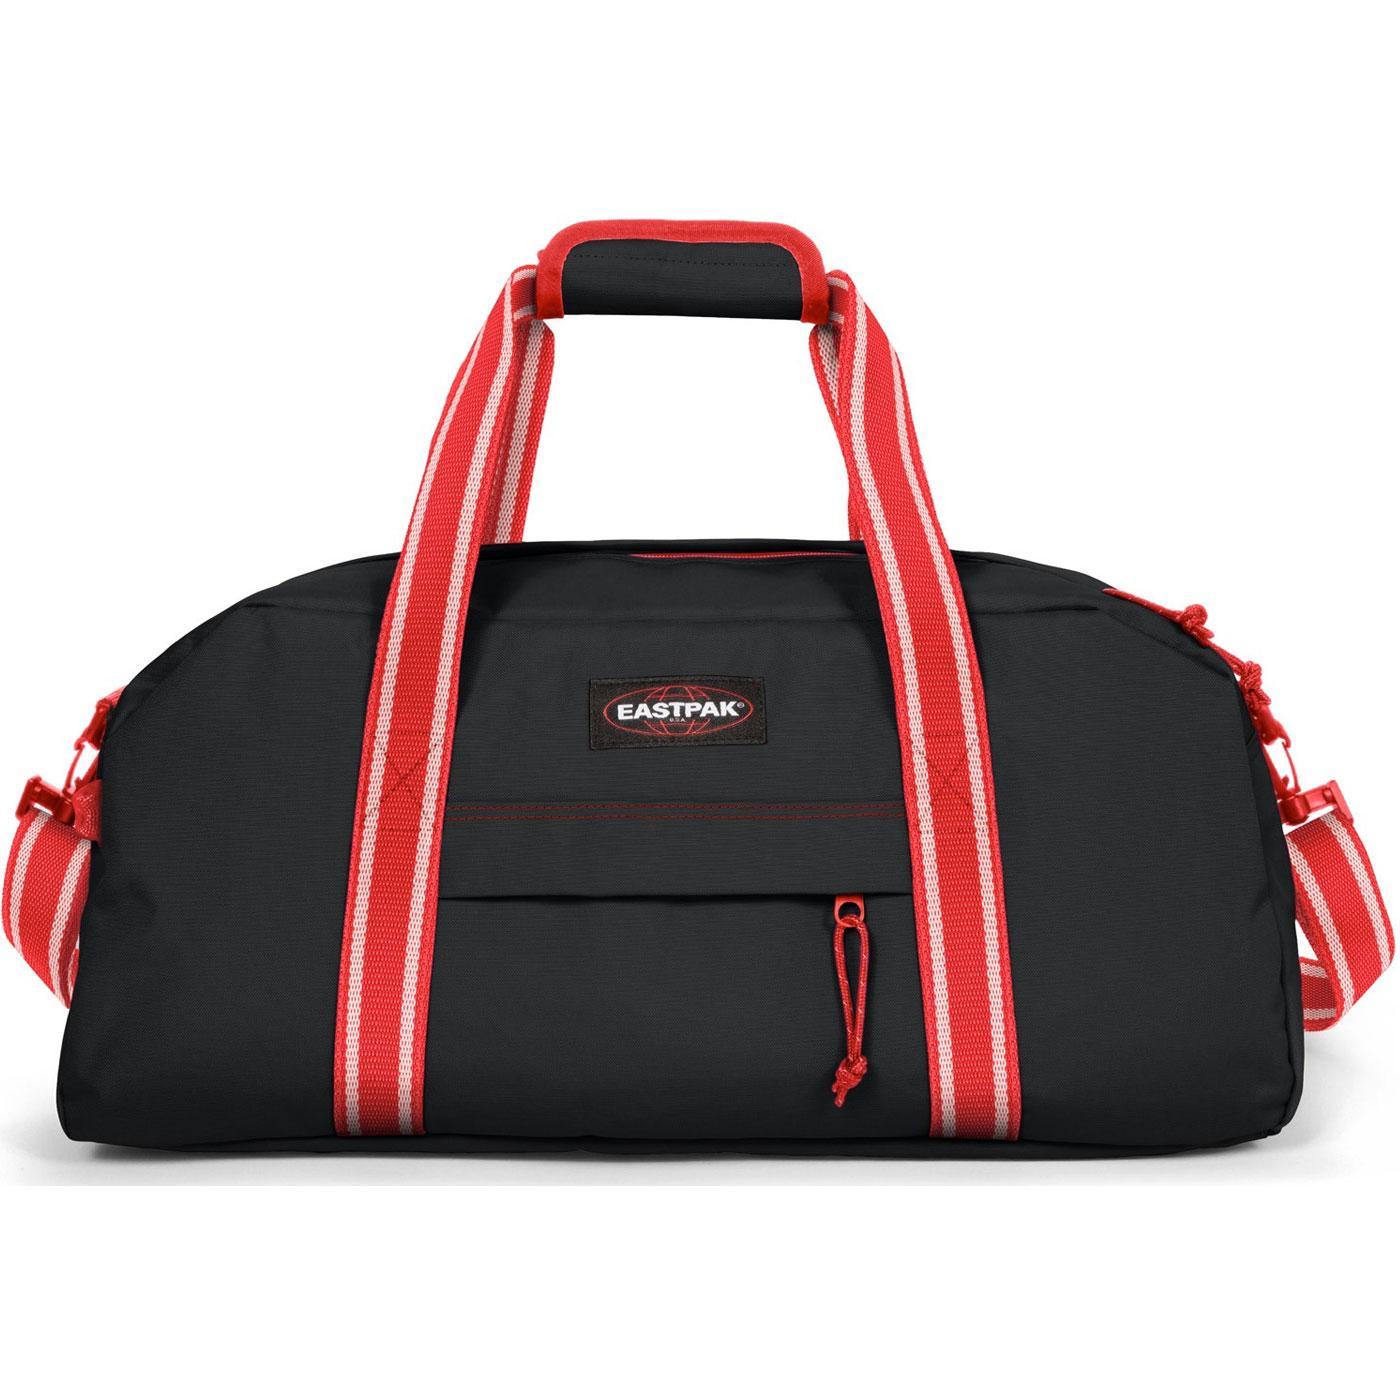 Stand+ EASTPAK Retro Mod Holdall Bag BLACKOUT DARK